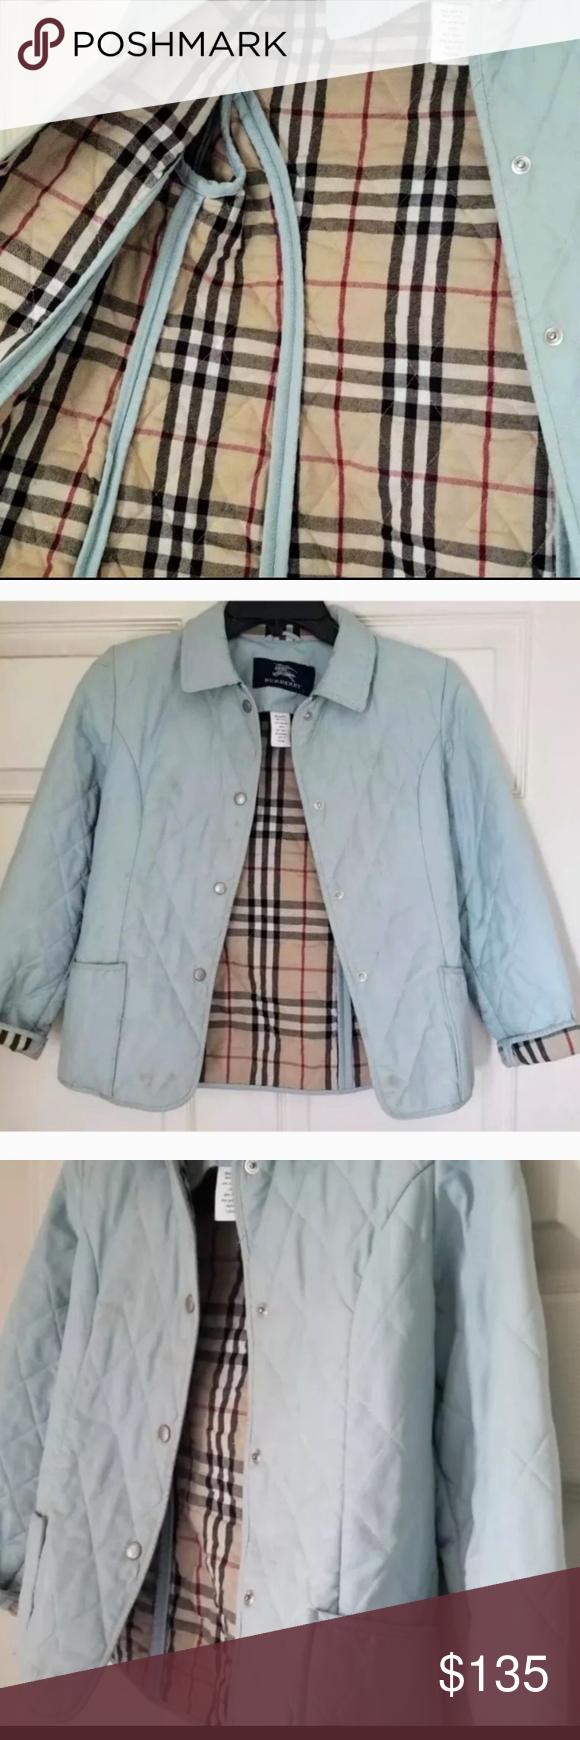 Burberry Quilted Light Blue Jacket Light Blue Jacket Blue Jacket Quilted Jacket